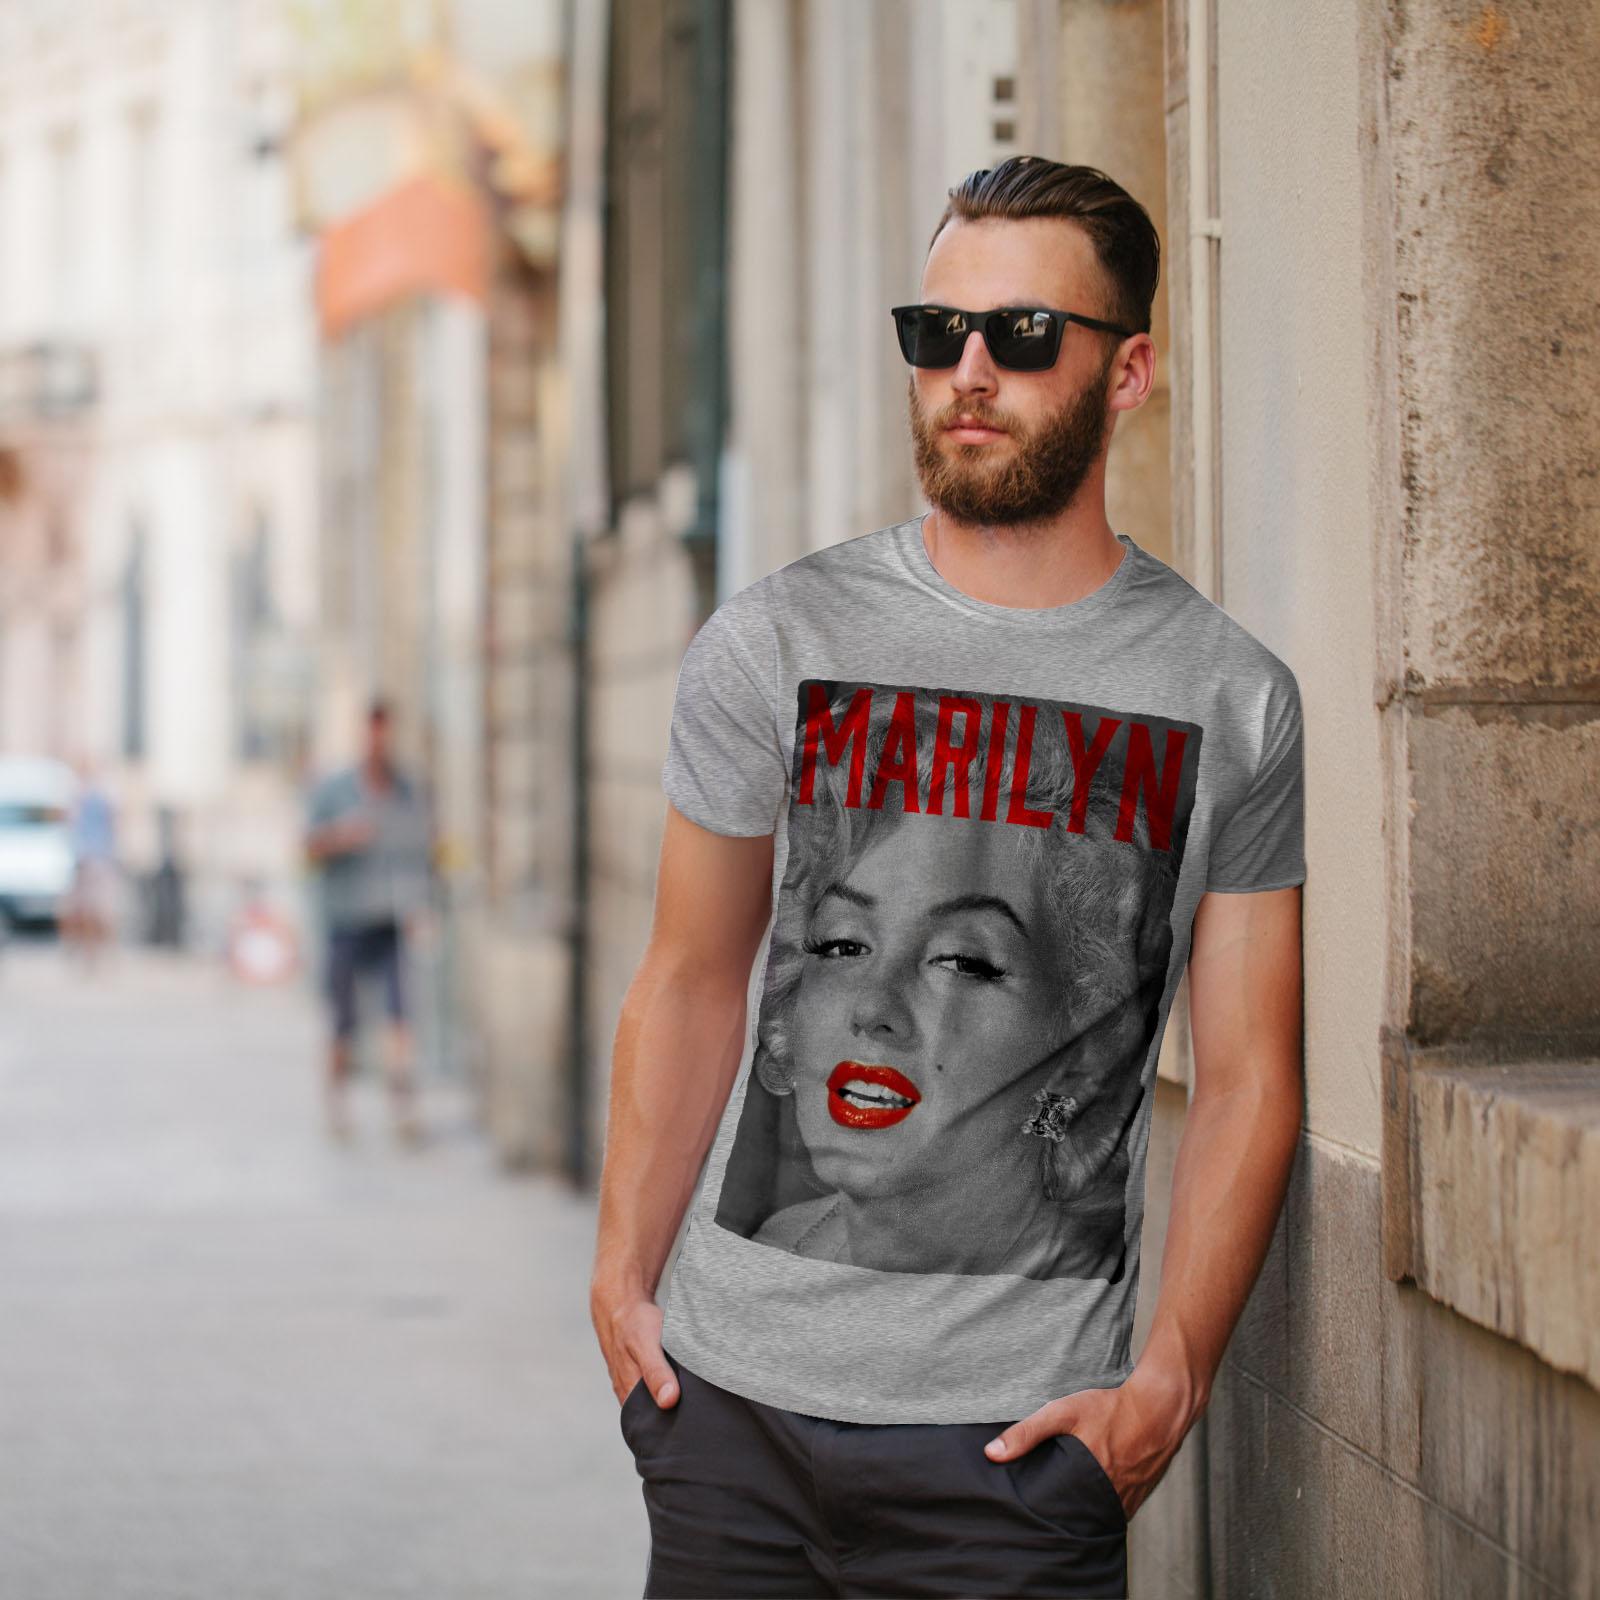 Wellcoda-Marilyn-Retro-Photo-Mens-T-shirt-Urban-Graphic-Design-Printed-Tee thumbnail 17